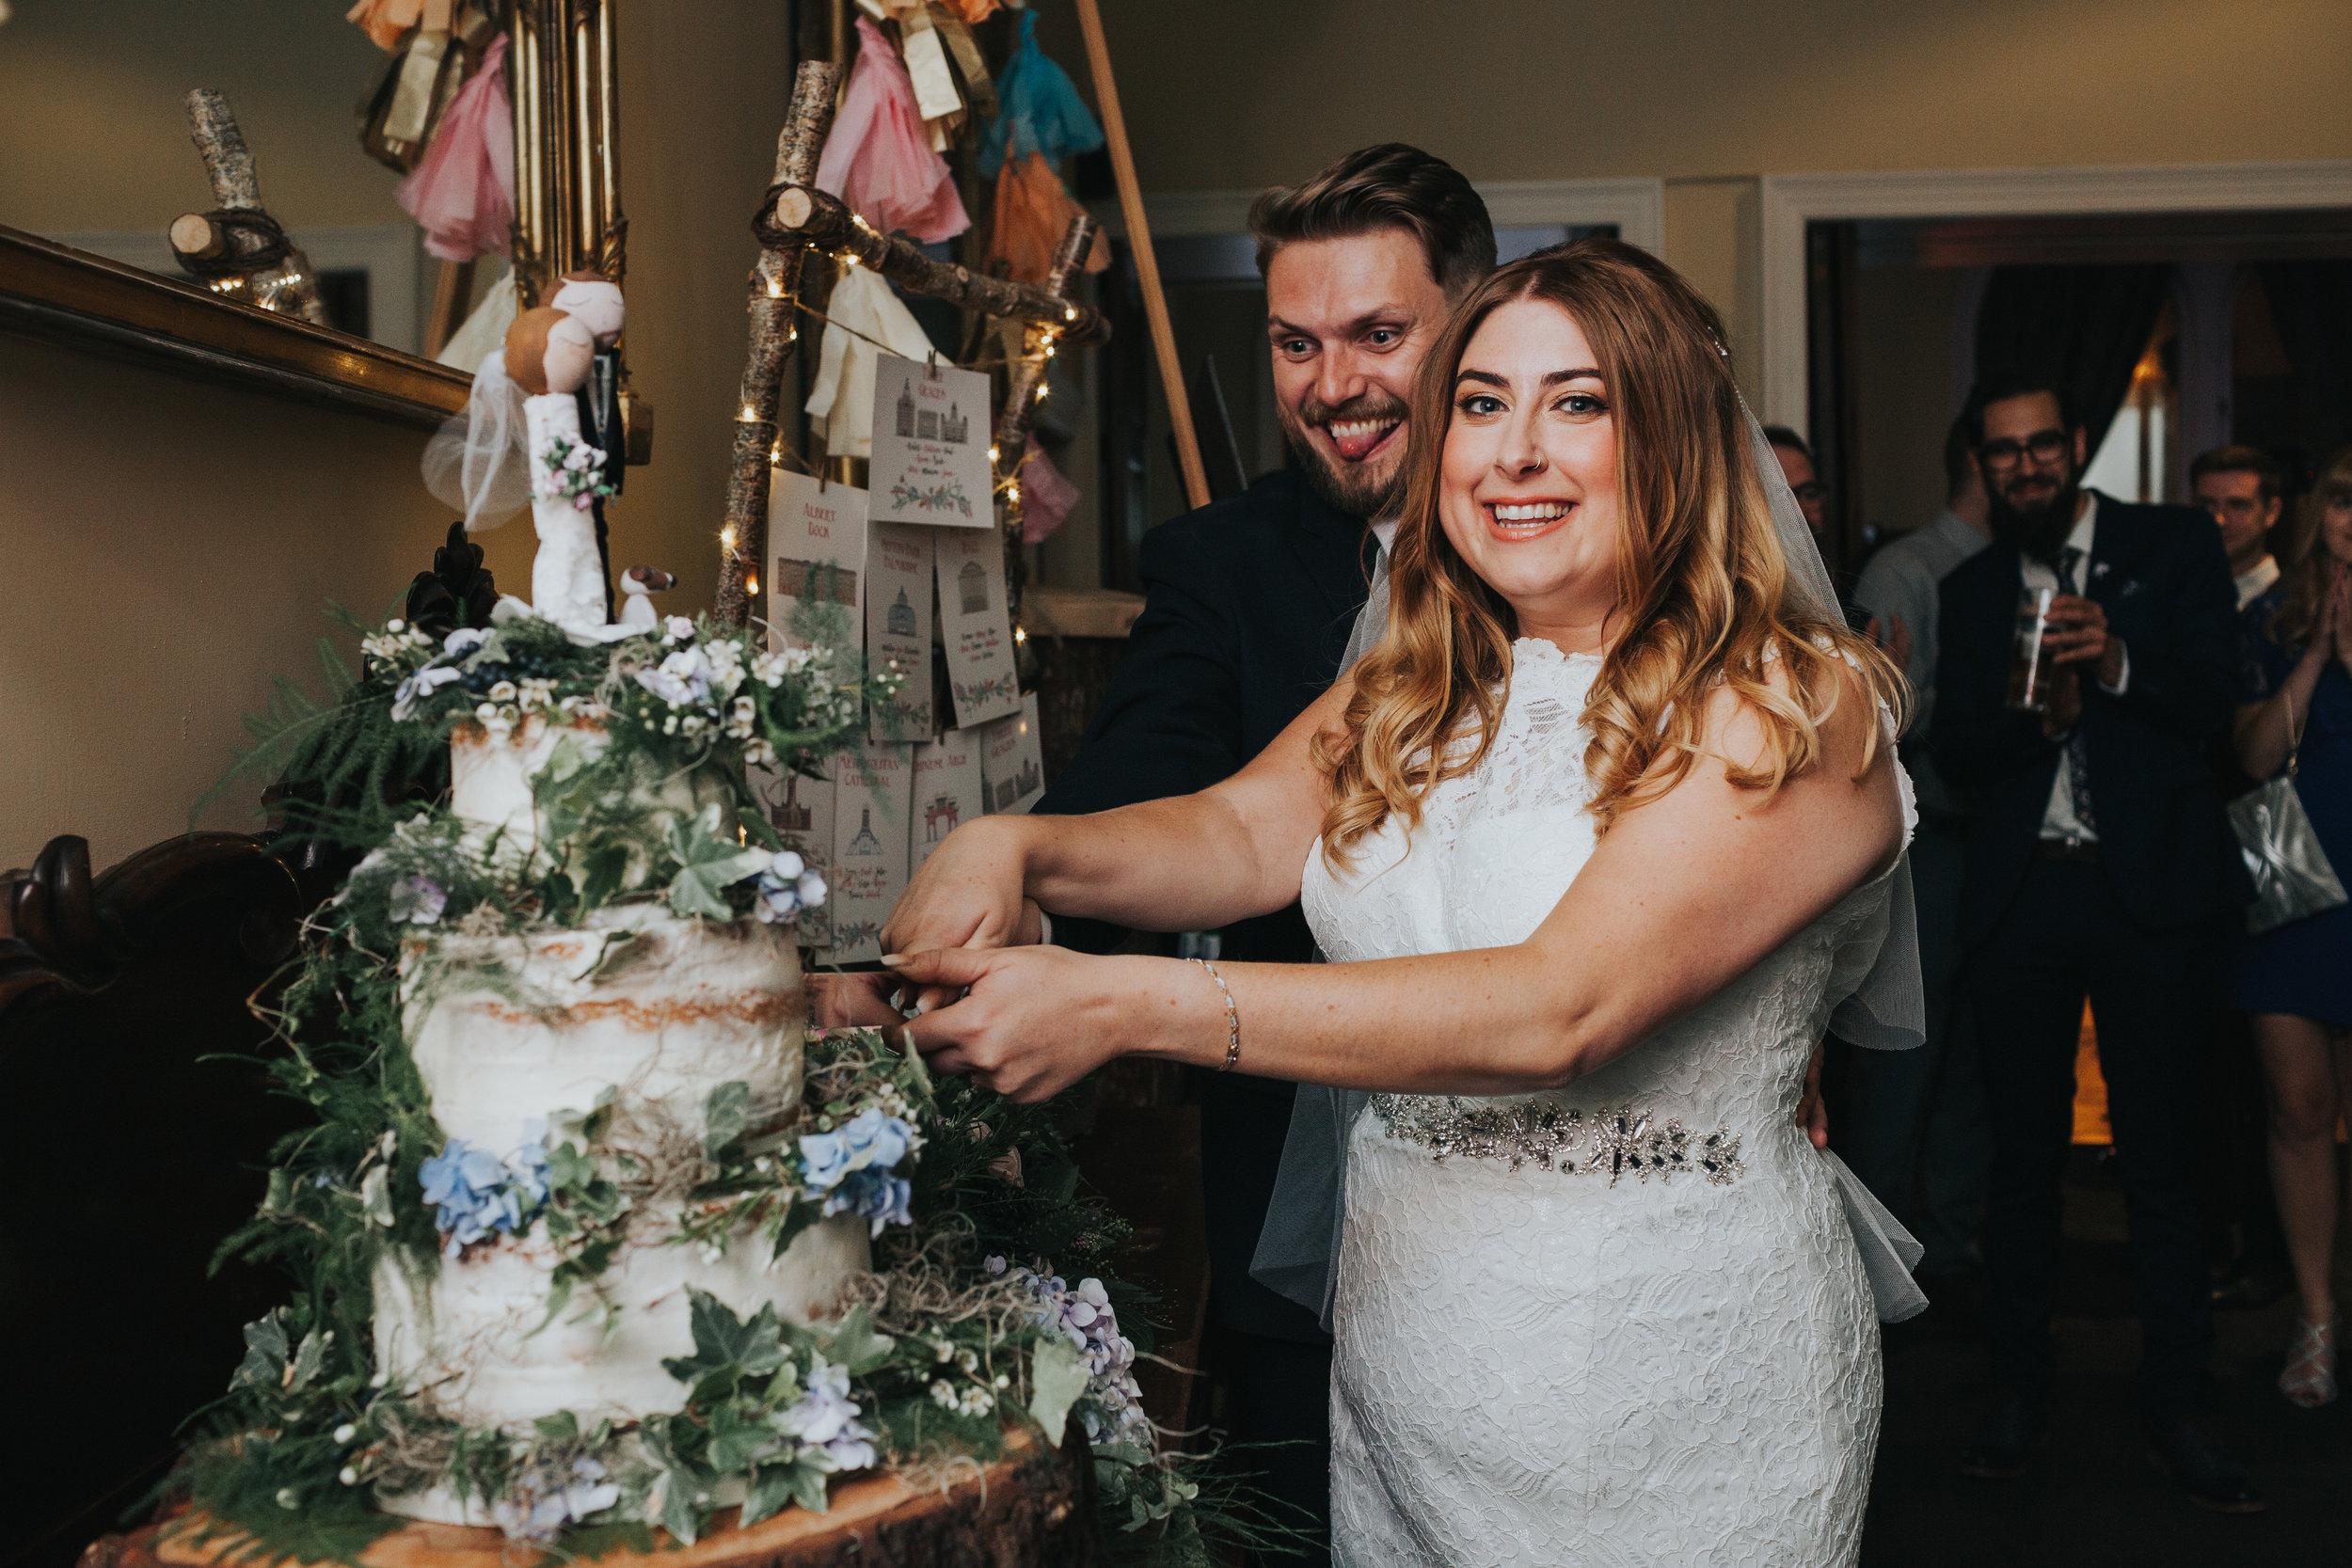 Bride and Groom Cut Wedding Cake.